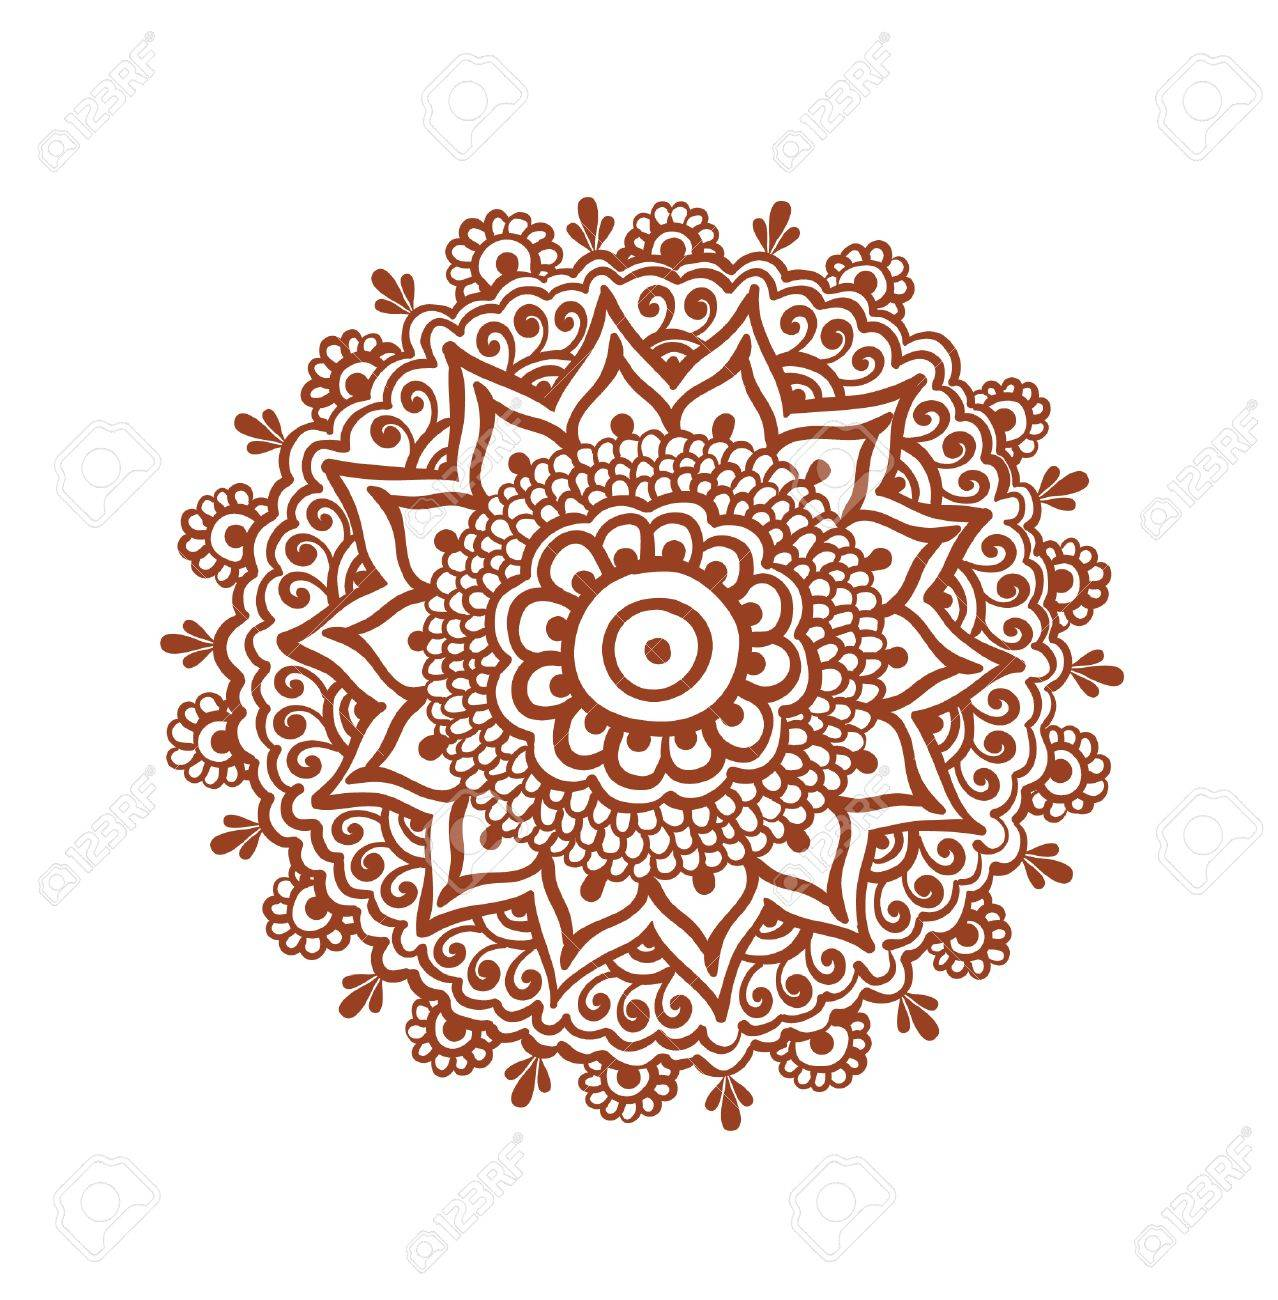 Ornate Circle Mandala Traditional Indian Tattoo Henna Design